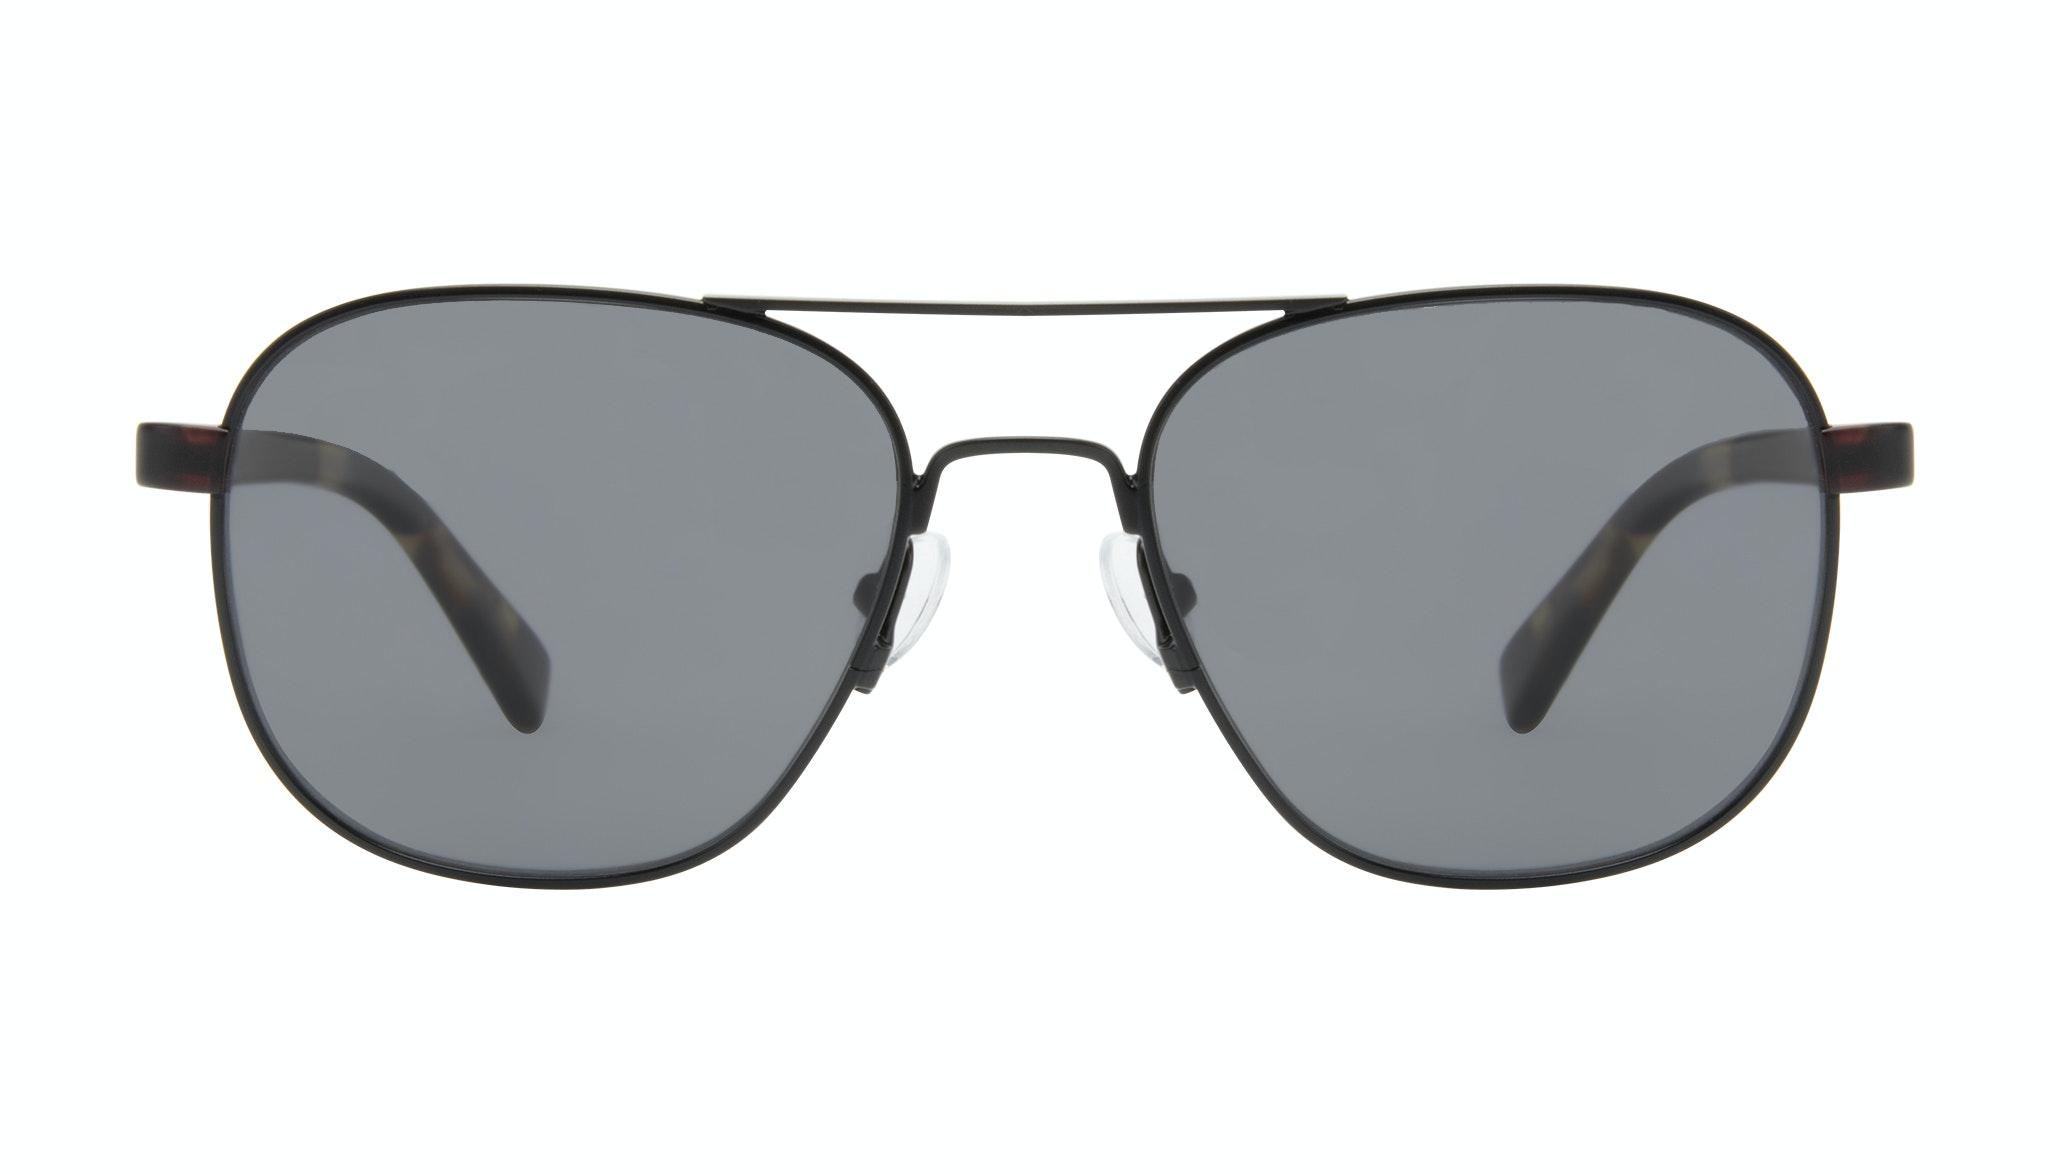 Affordable Fashion Glasses Aviator Sunglasses Men Pulse Gun Metal Front